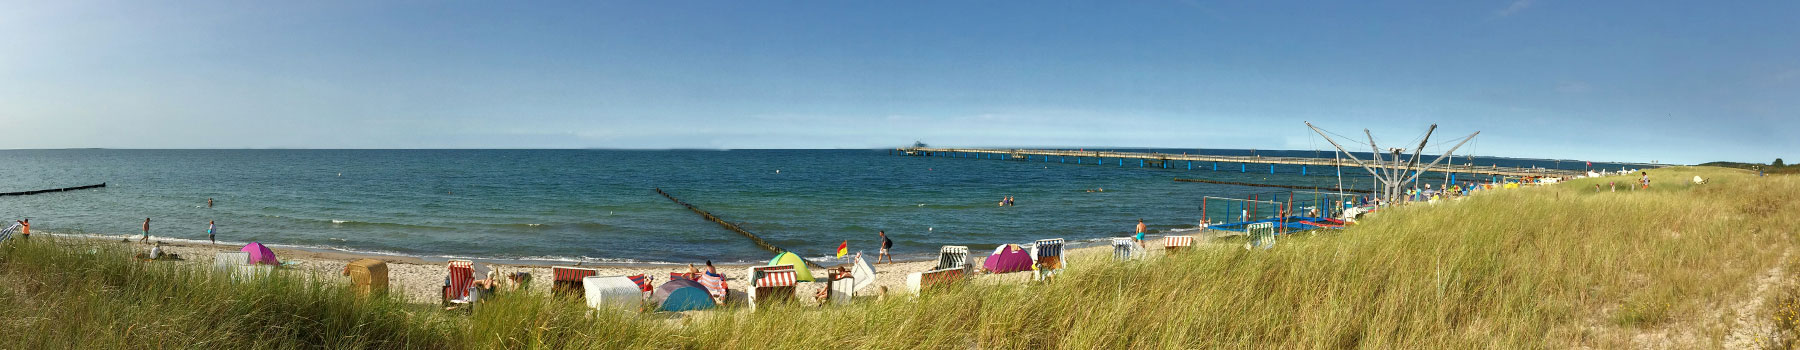 Strand schmal - Hotel Haus am Meer